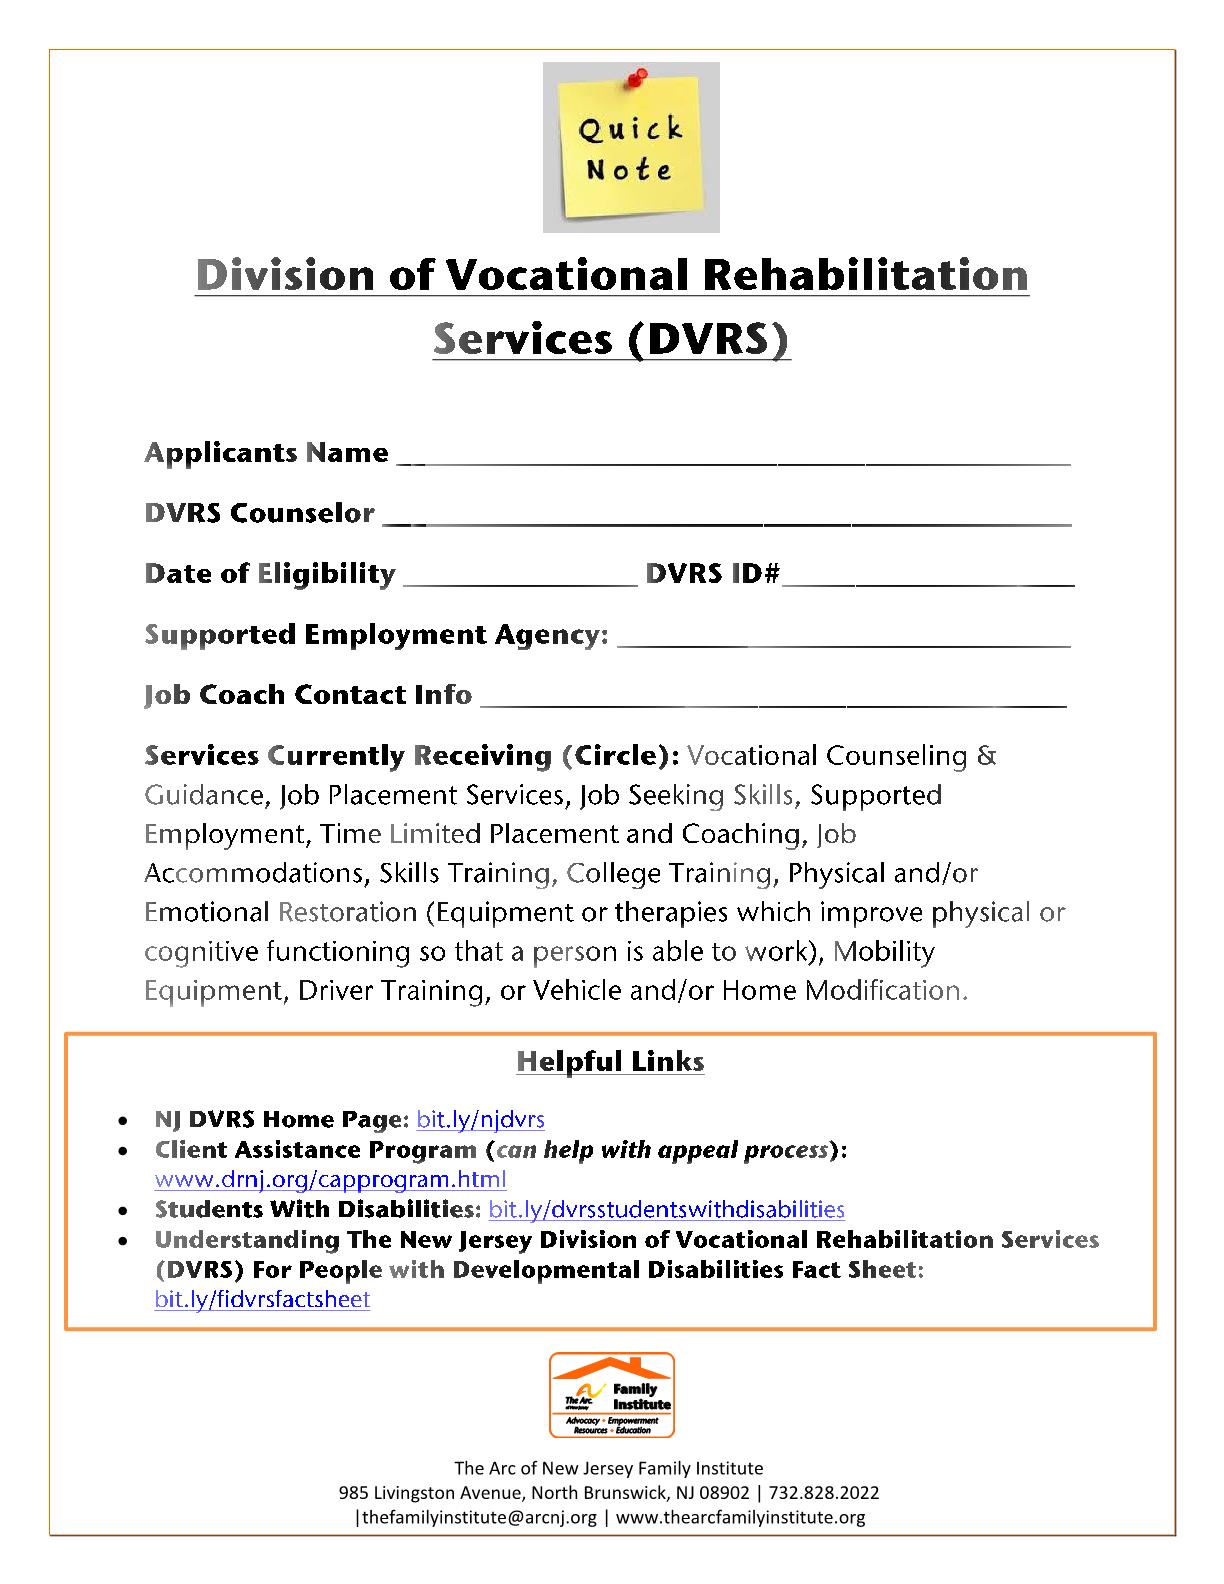 Division of Vocational Rehabilitation Services (DVRS)